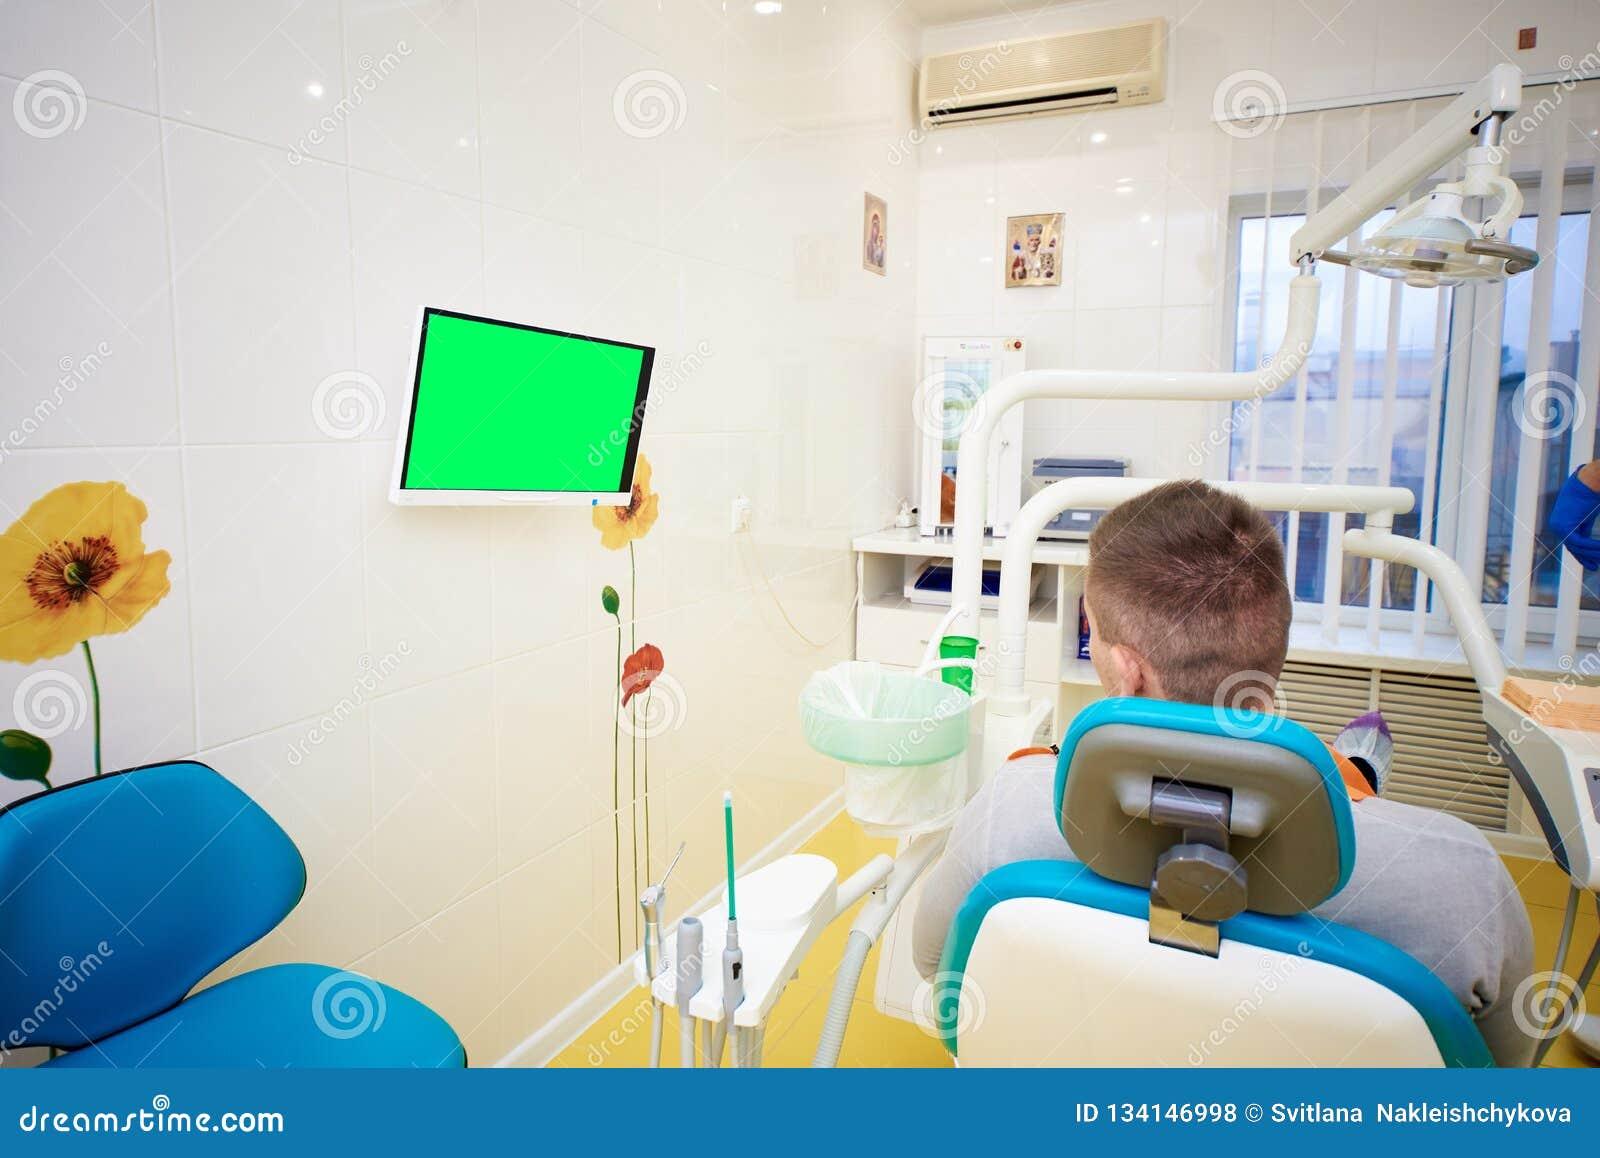 Bureau dentaire, art dentaire, soins dentaires, examen médical